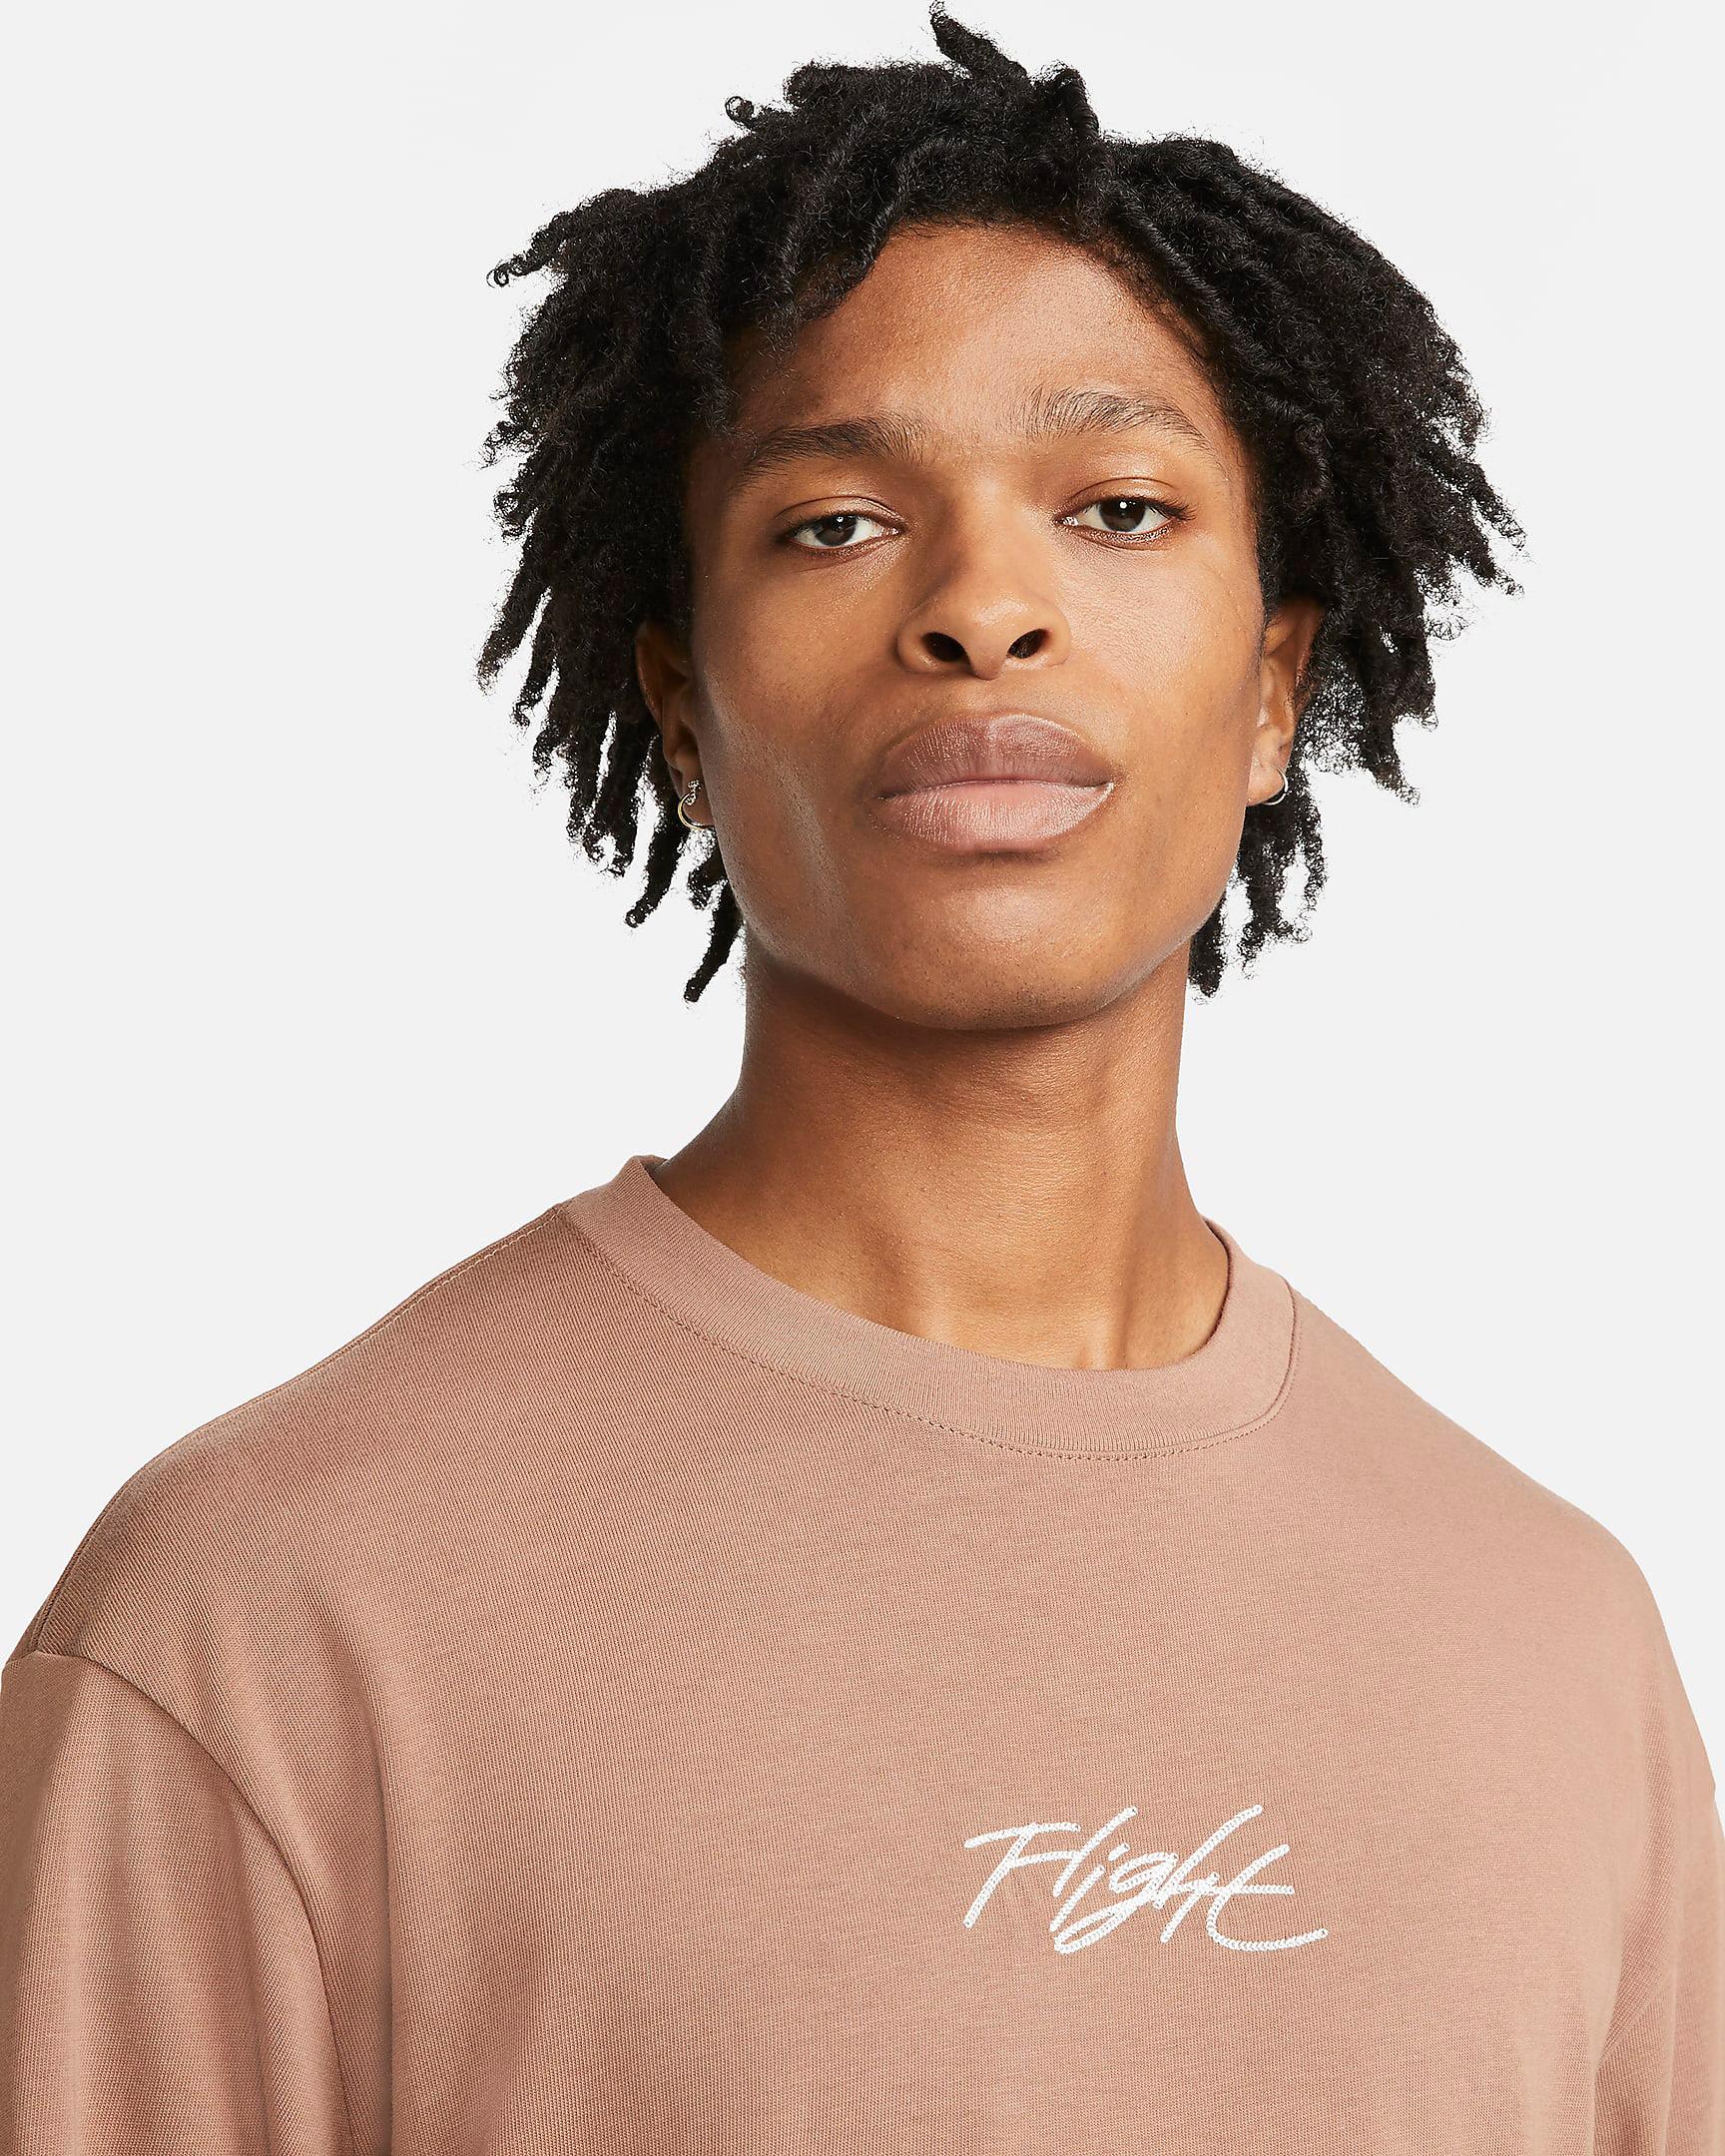 jordan-archaeo-brown-long-sleeve-shirt-2